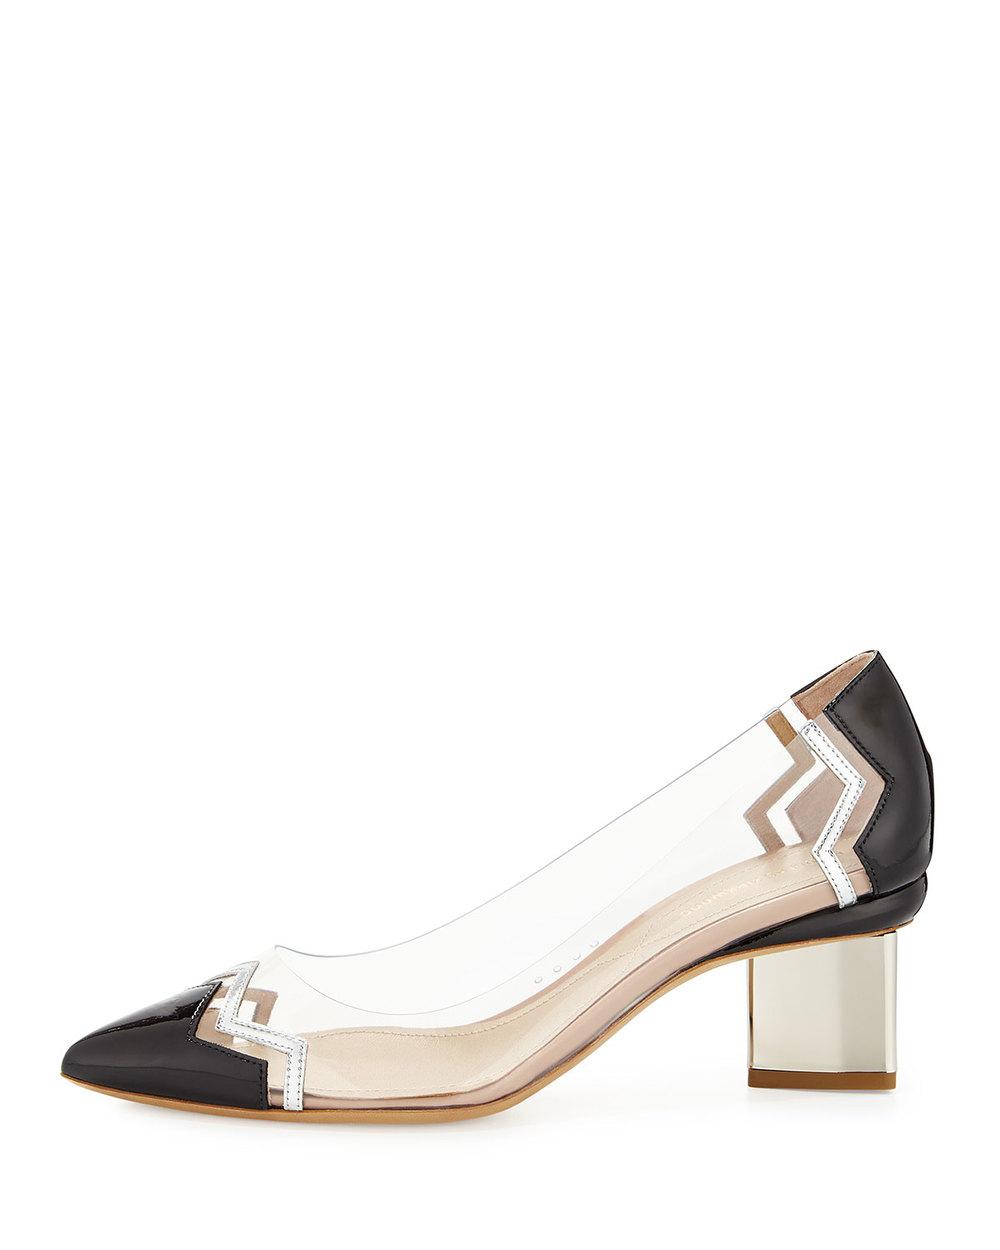 Glass slippers worthy of a punk rock Cinderella.  Nicholas Kirkwood chevron block-heel pump, $785, at  Neiman Marcus .